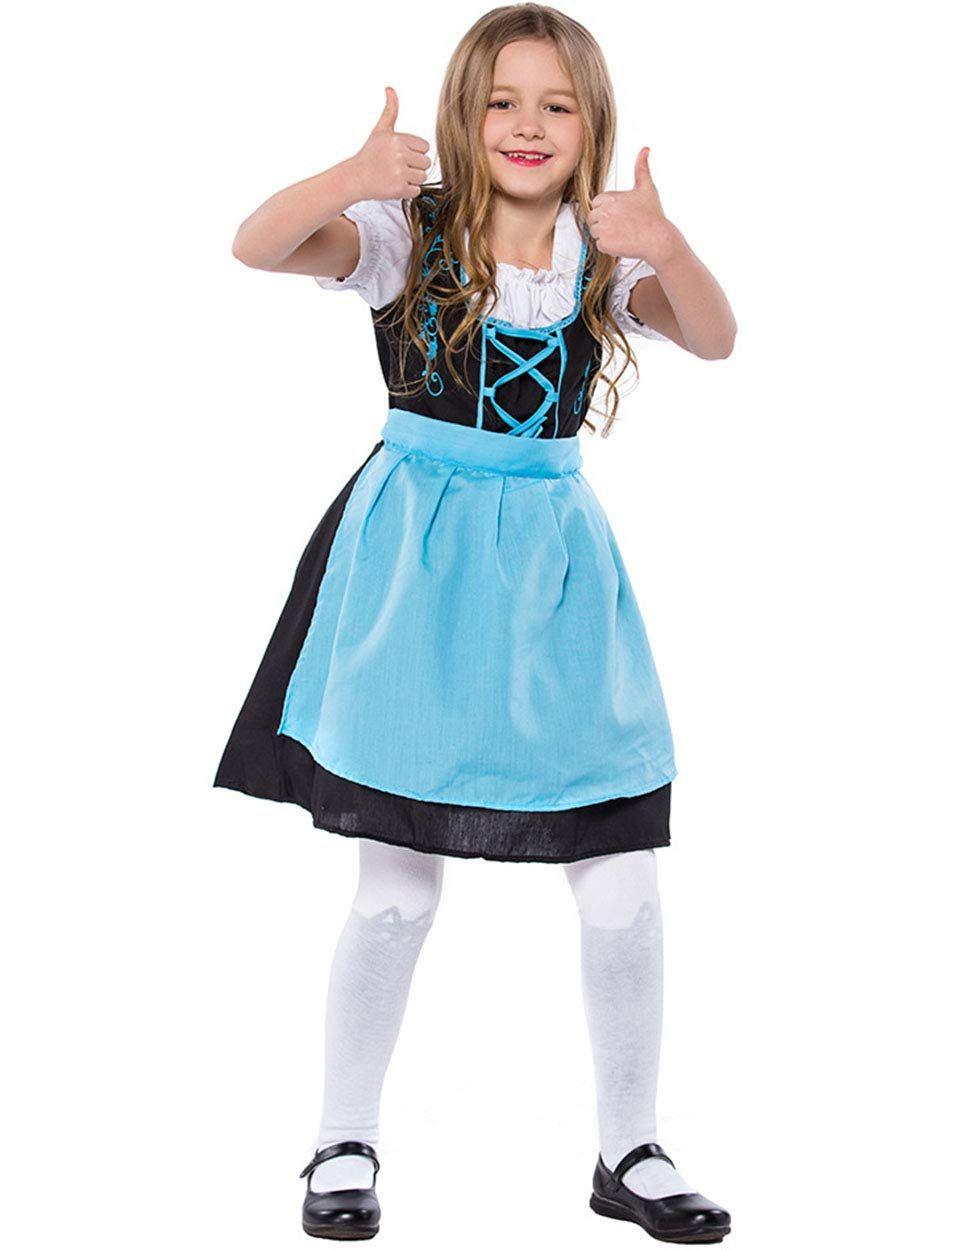 Erwachsenen oktoberfest mädchen kostüm kostüm ball foto 4